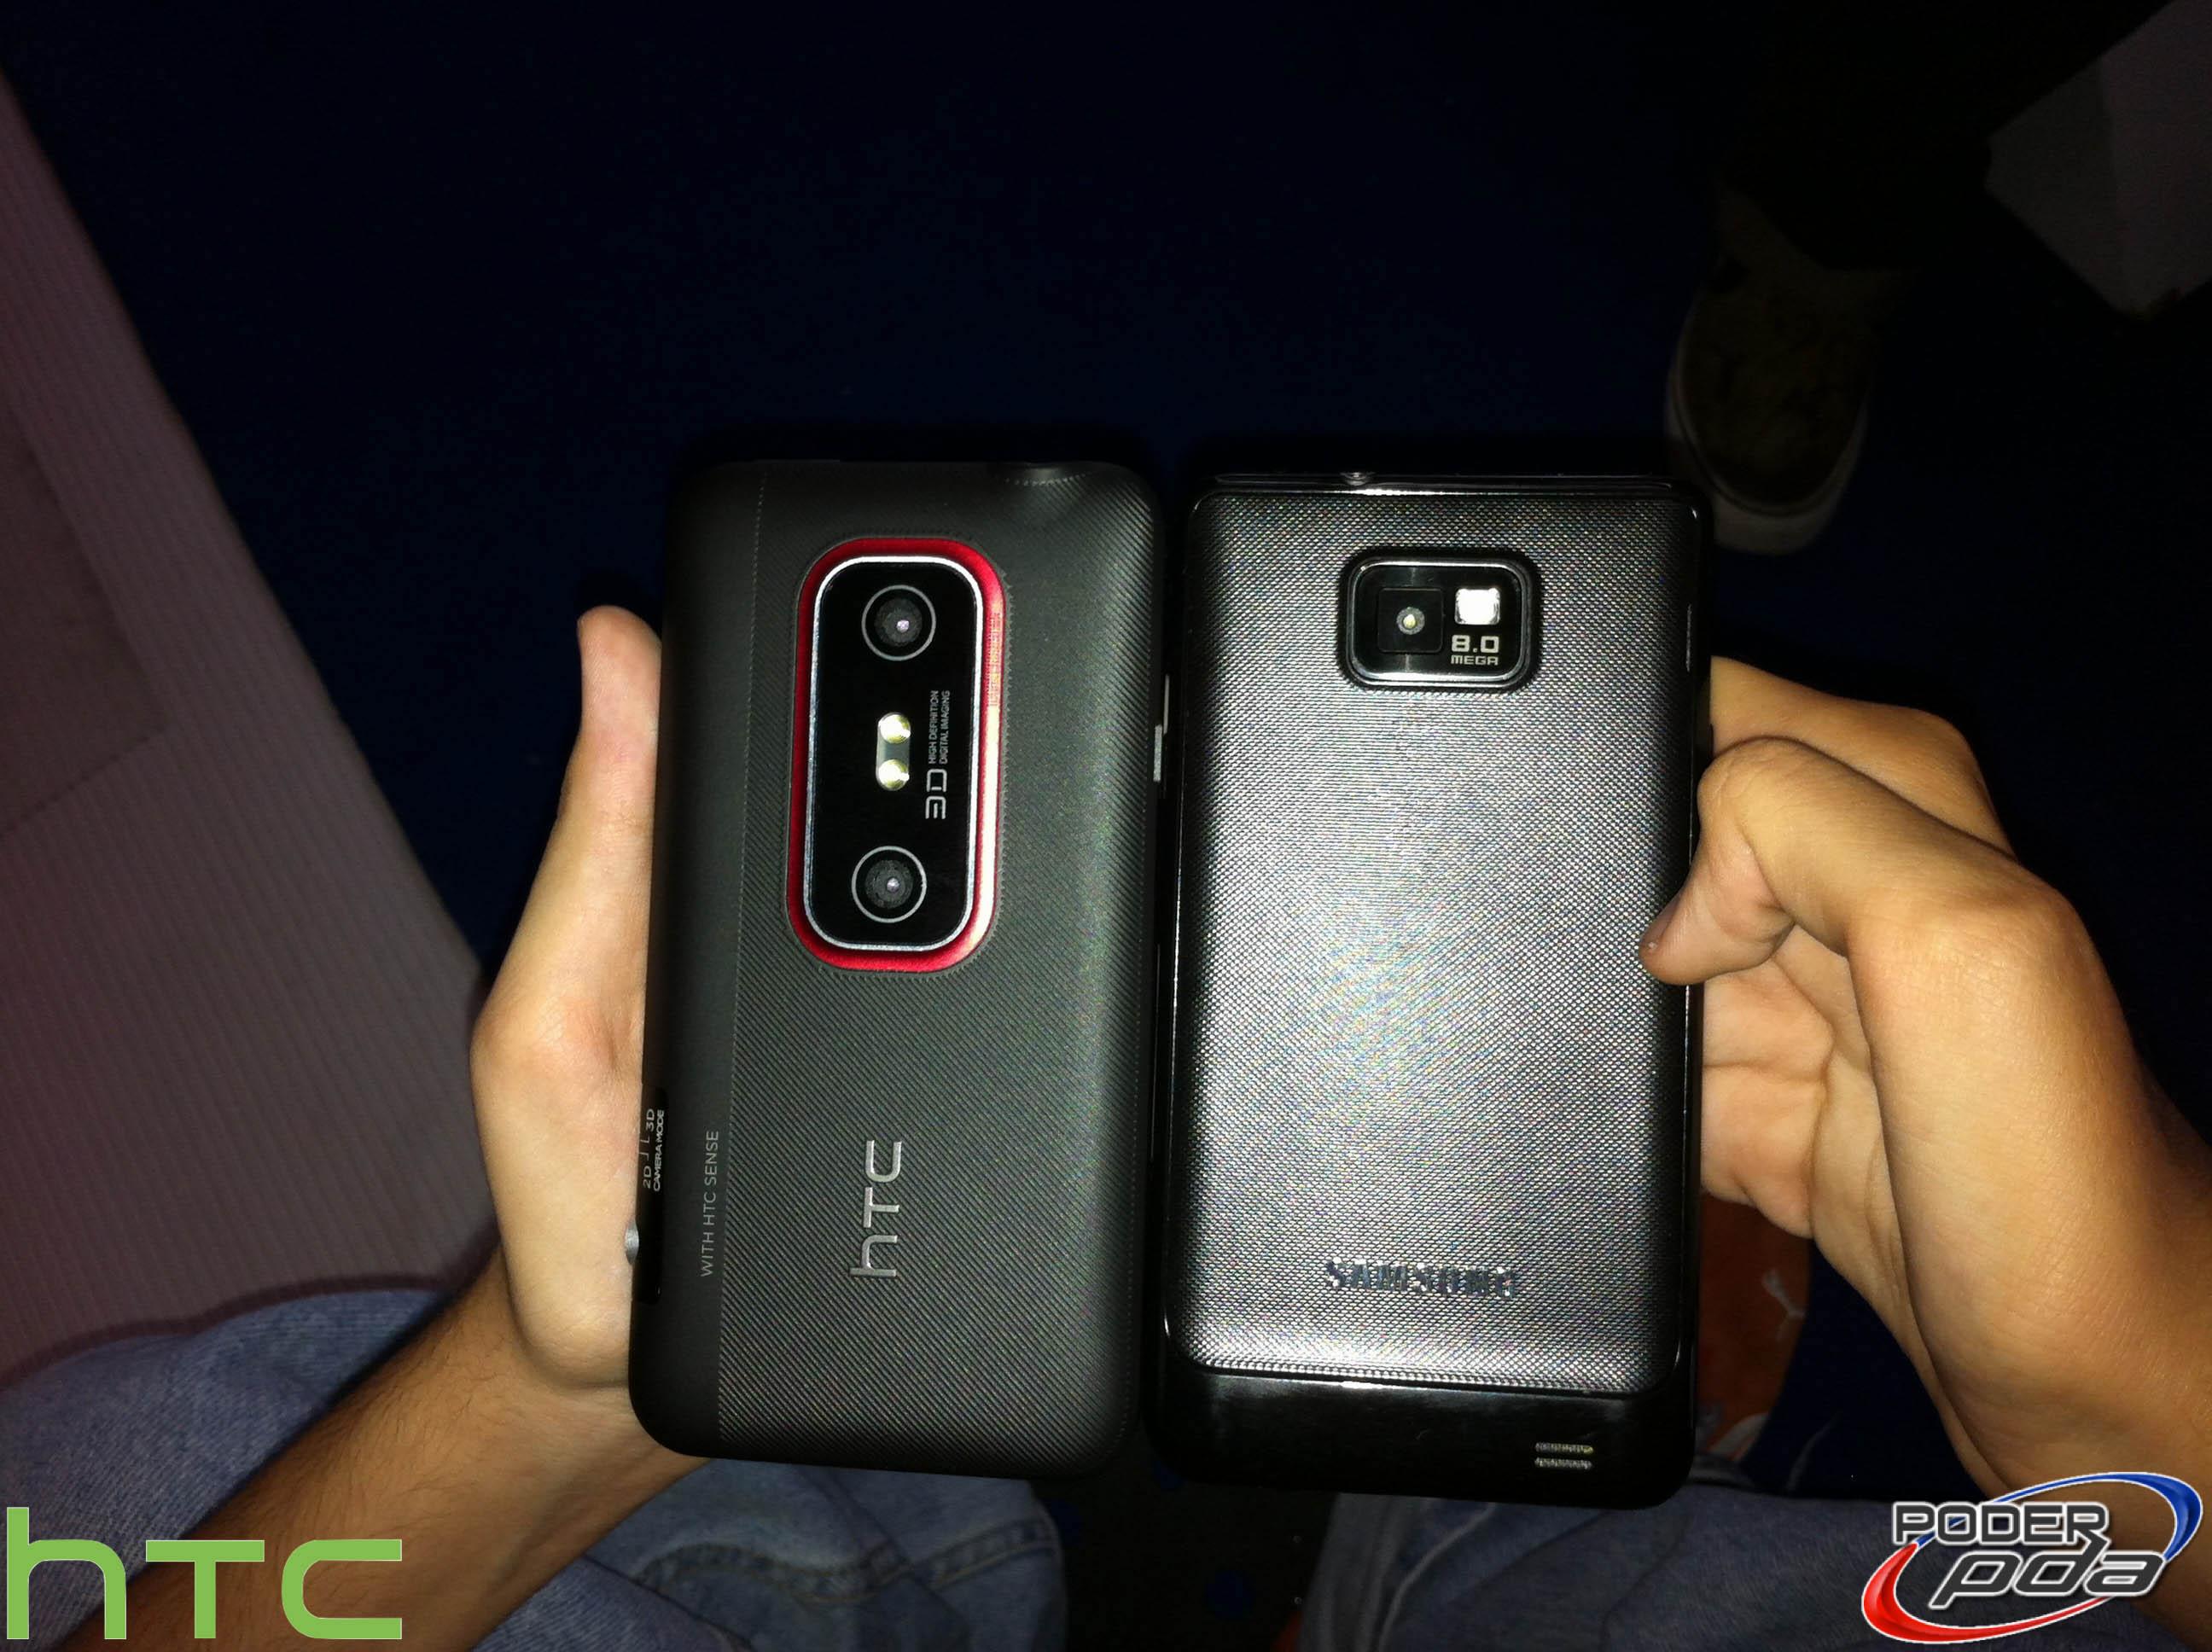 HTC-Inspire-3D-en-Mexico-ADMX3-9